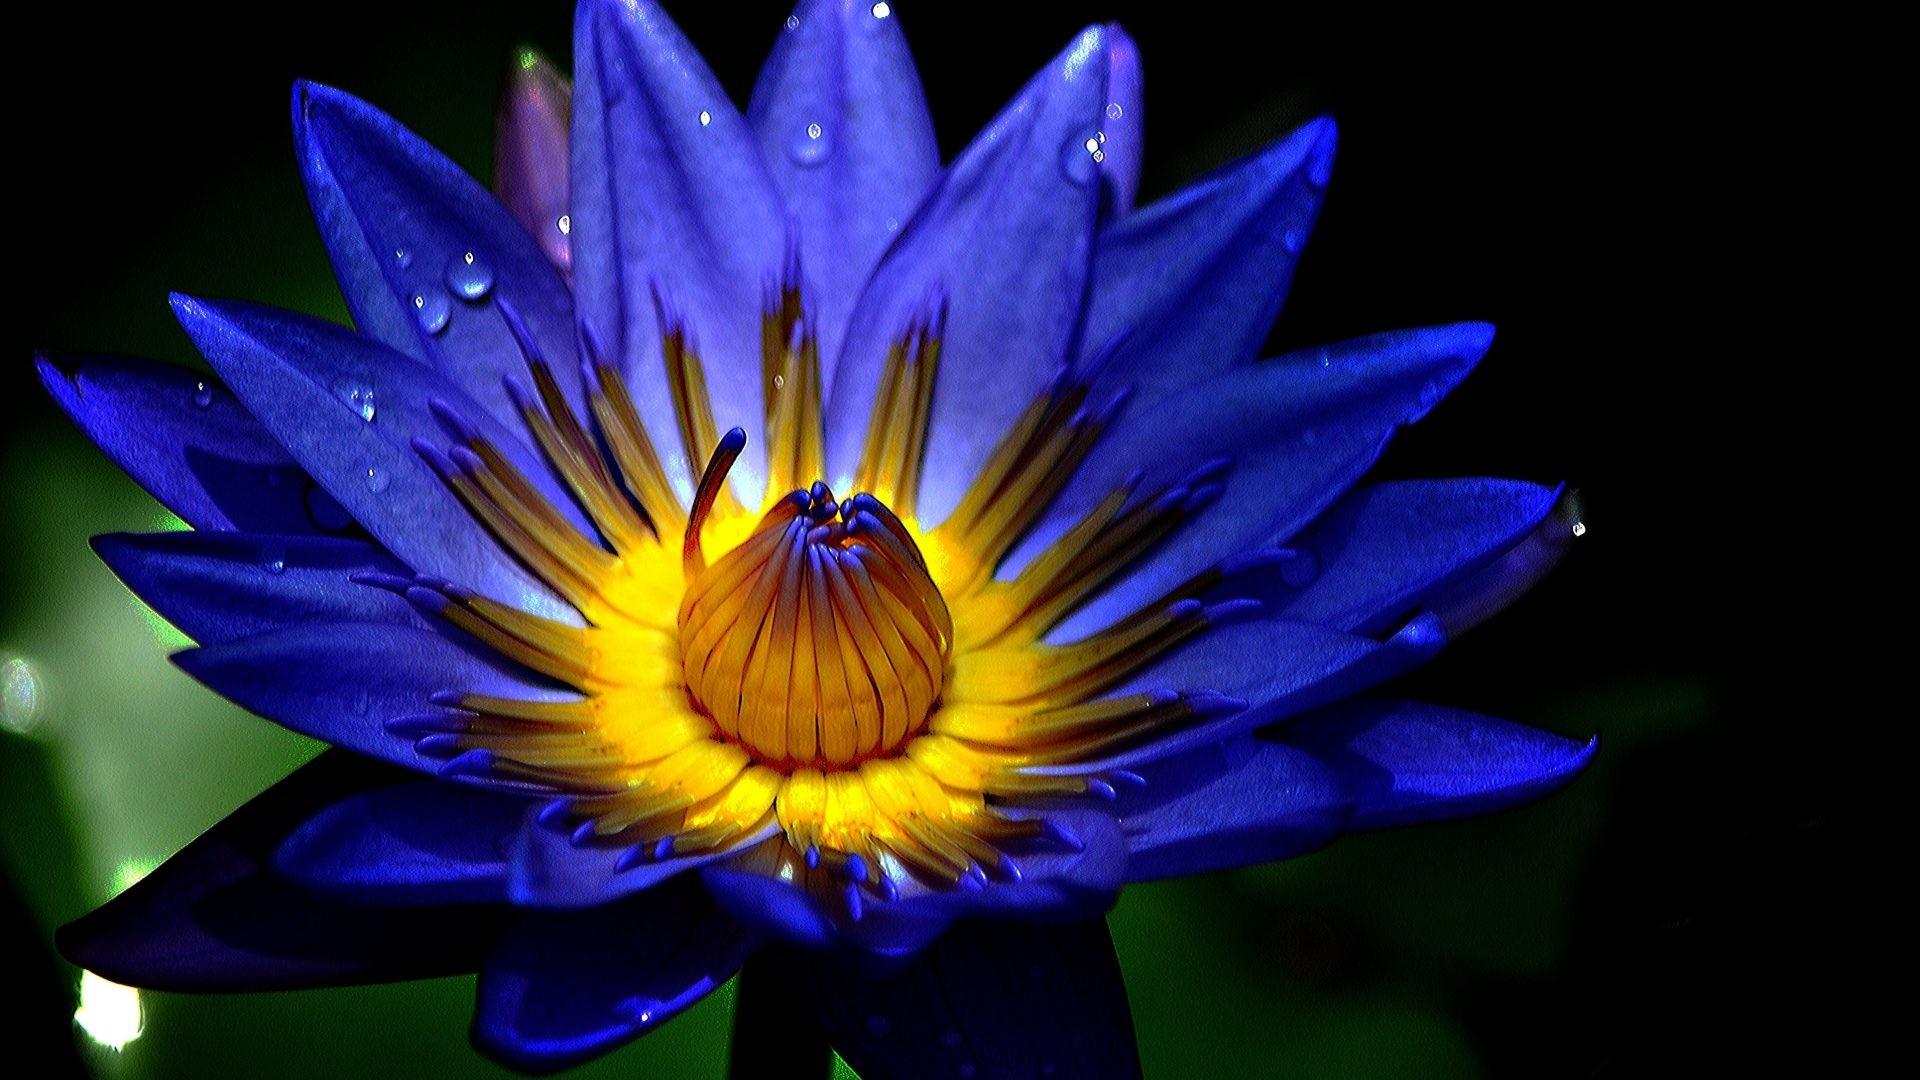 Flowers – Water Drop Rain Flower Drops Macro Background Wallpaper Nature 3d  for HD 16: